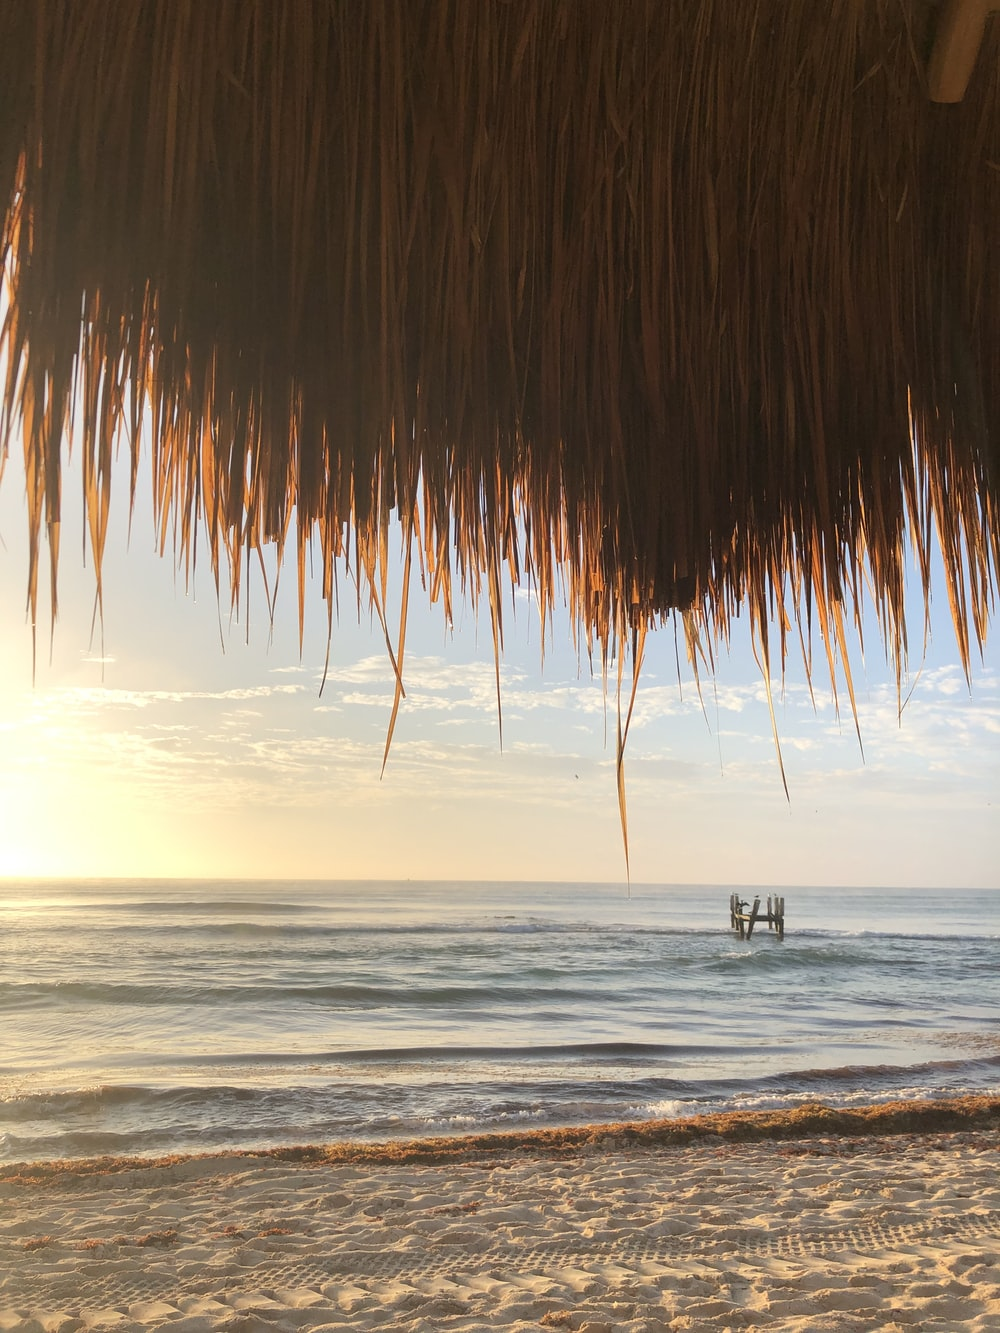 landscape of a sandy beach